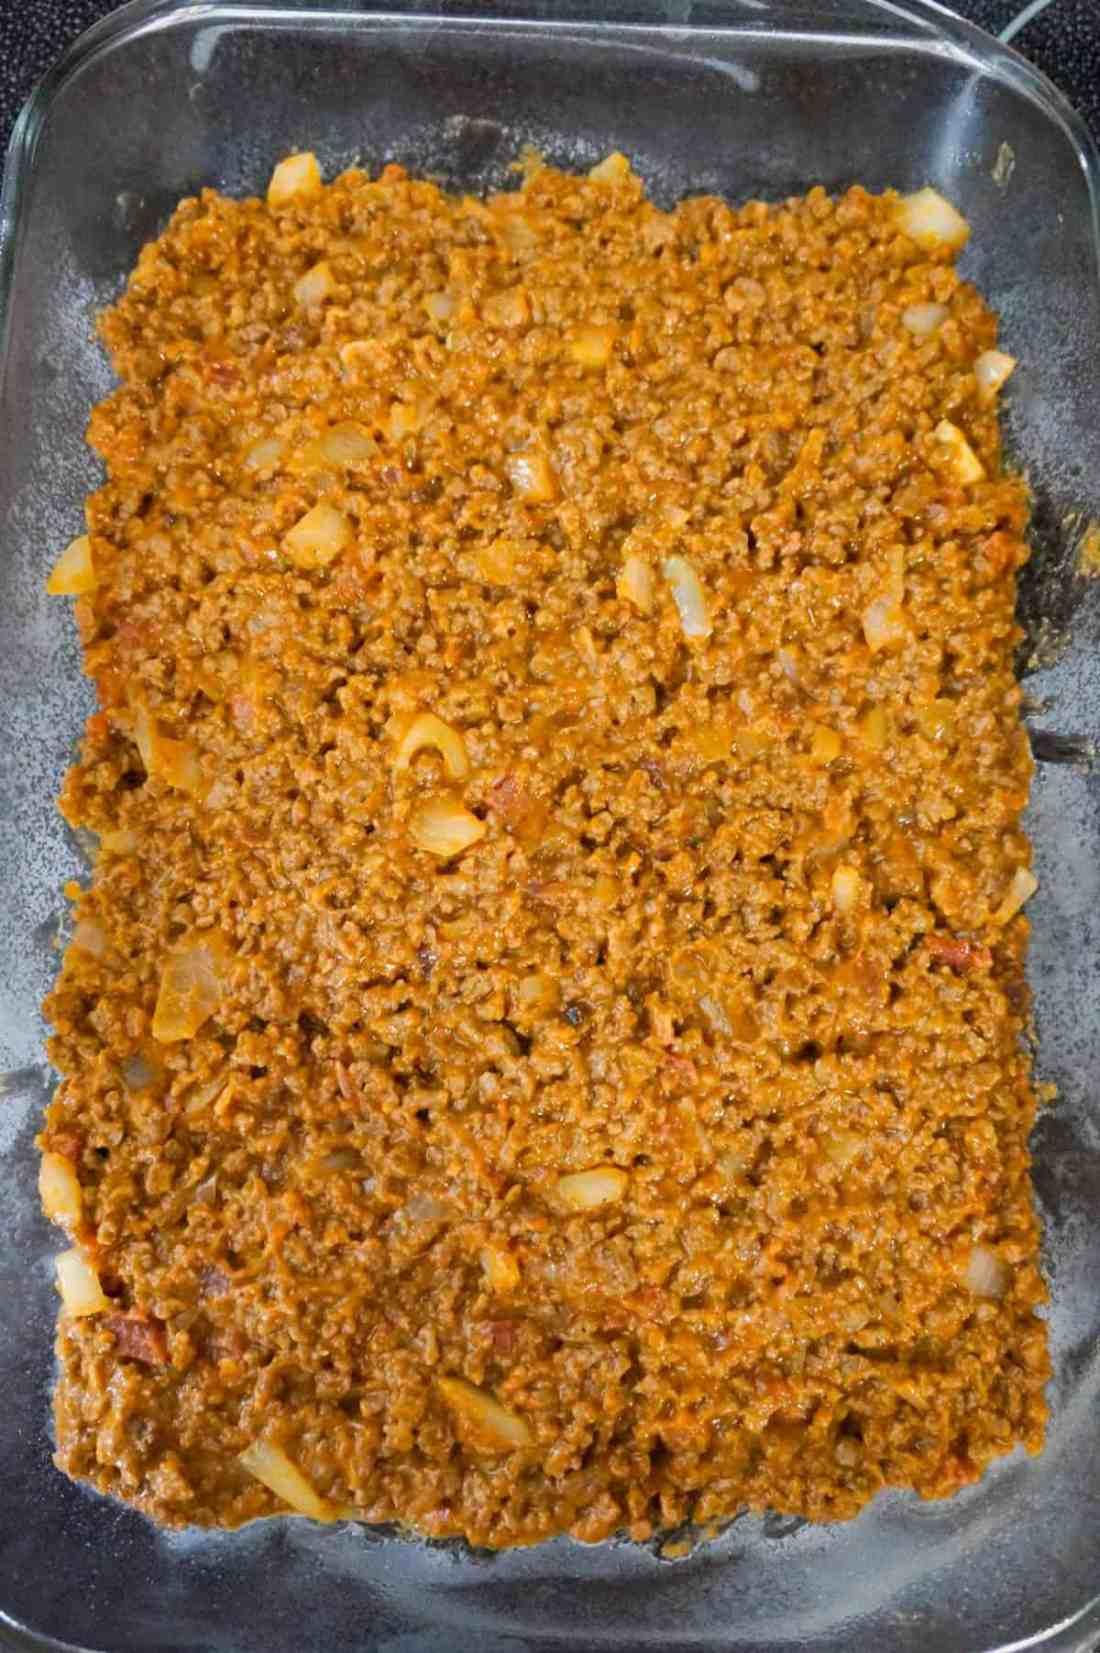 ground beef mixture in a 9 x 13 inch baking dish